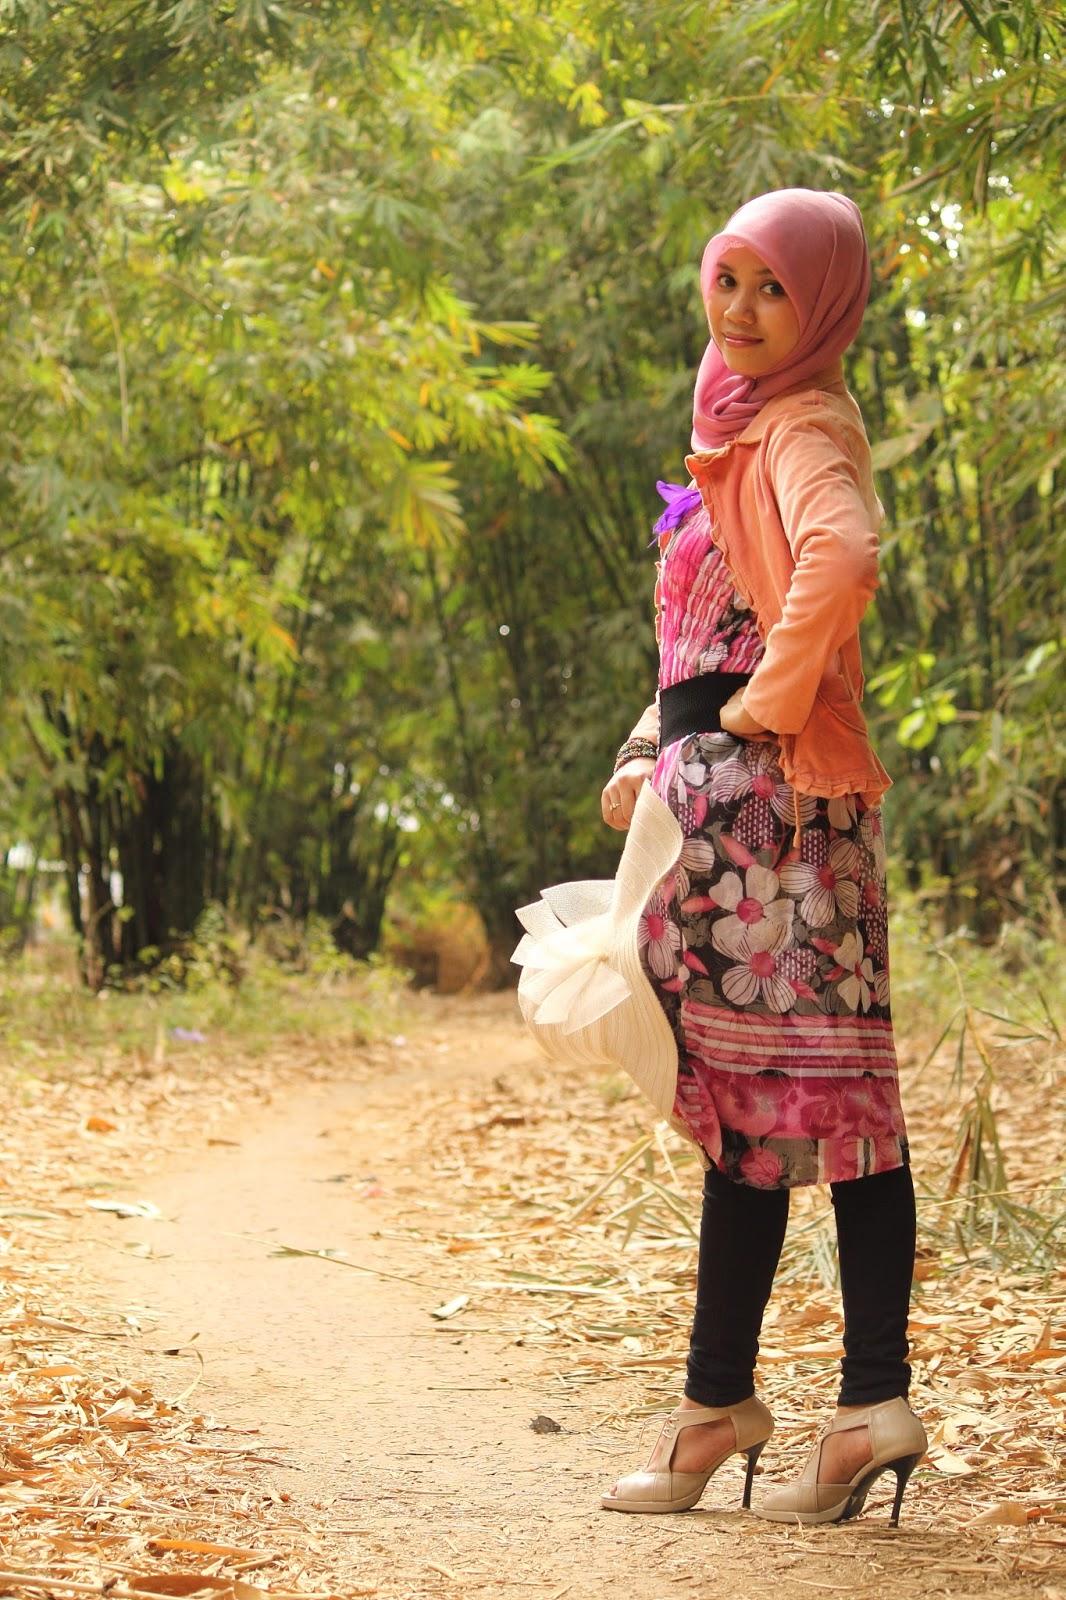 Hunting Model hijab cantik Hani Nirmalasari Jibaer Mahasiswa Kampus manis harian Hunting Model hijab cantik Hani Nirmalasari Jibaer Mahasiswa Kampus manis hoodie Hunting Model hijab cantik Hani Nirmalasari Jibaer Mahasiswa Kampus manis hitam putih Hunting Model hijab cantik Hani Nirmalasari Jibaer Mahasiswa Kampus manis hits Hunting Model hijab cantik Hani Nirmalasari Jibaer Mahasiswa Kampus manis hari ini Hunting Model hijab cantik Hani Nirmalasari Jibaer Mahasiswa Kampus manis khimar Hunting Model hijab cantik Hani Nirmalasari Jibaer Mahasiswa Kampus manis instan Hunting Model hijab cantik Hani Nirmalasari Jibaer Mahasiswa Kampus manis indonesia